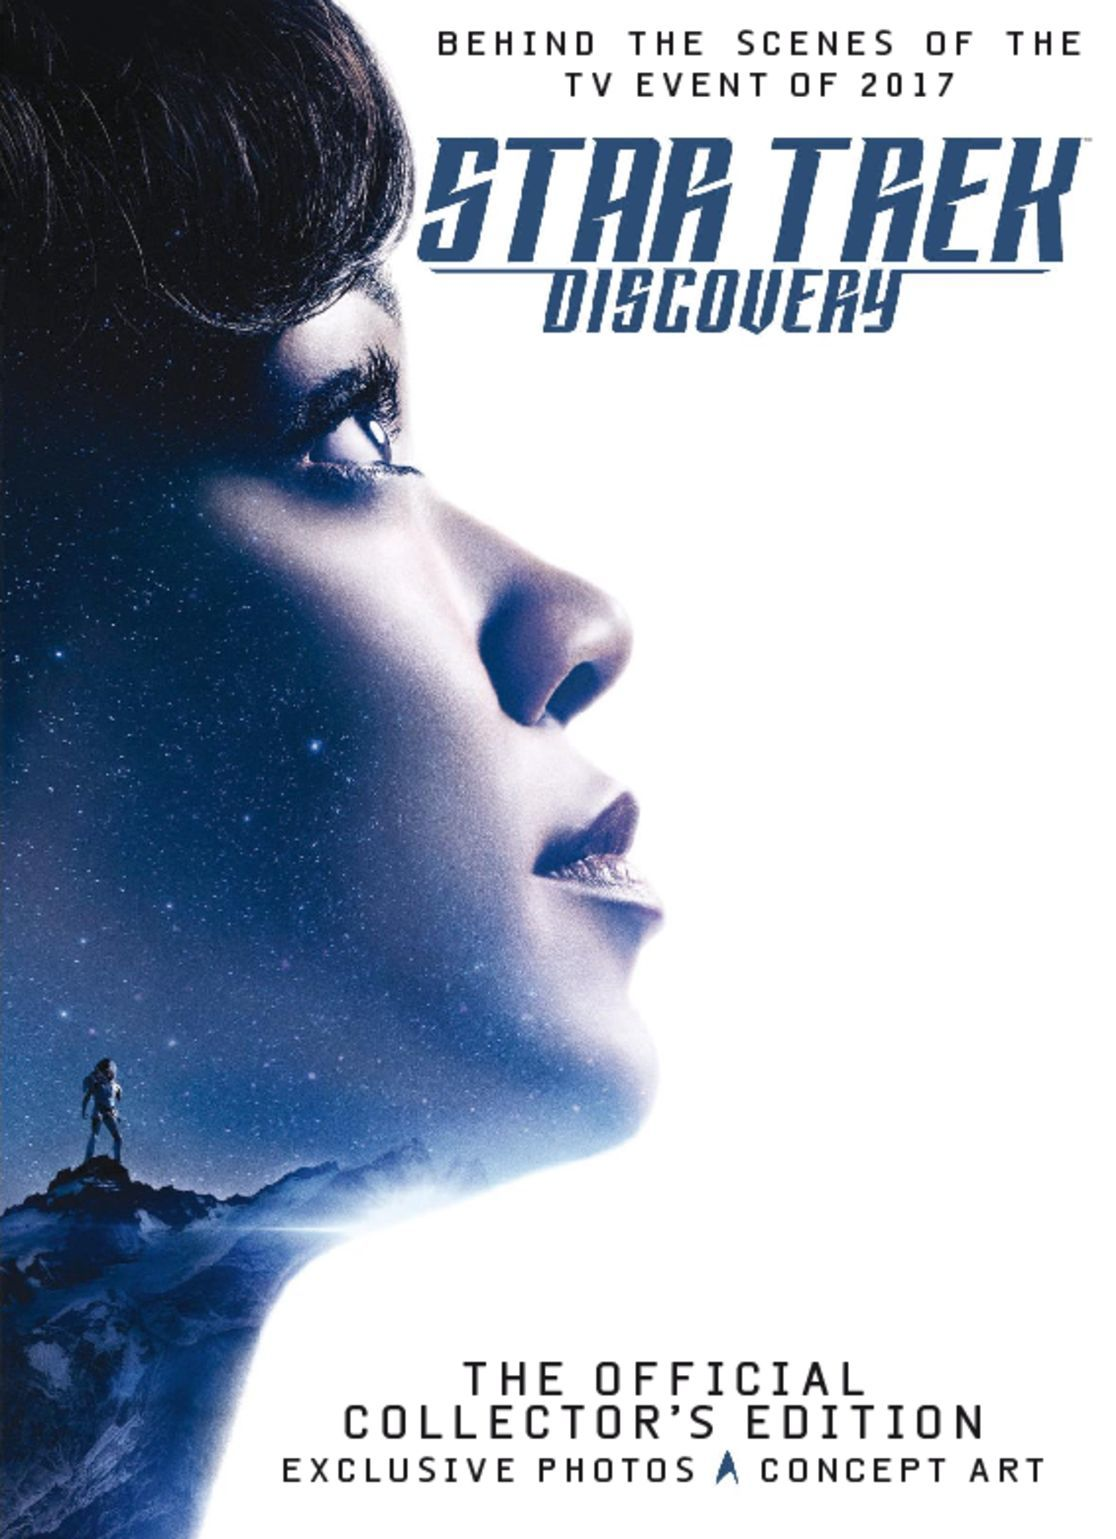 Star Trek Discovery Special Digital